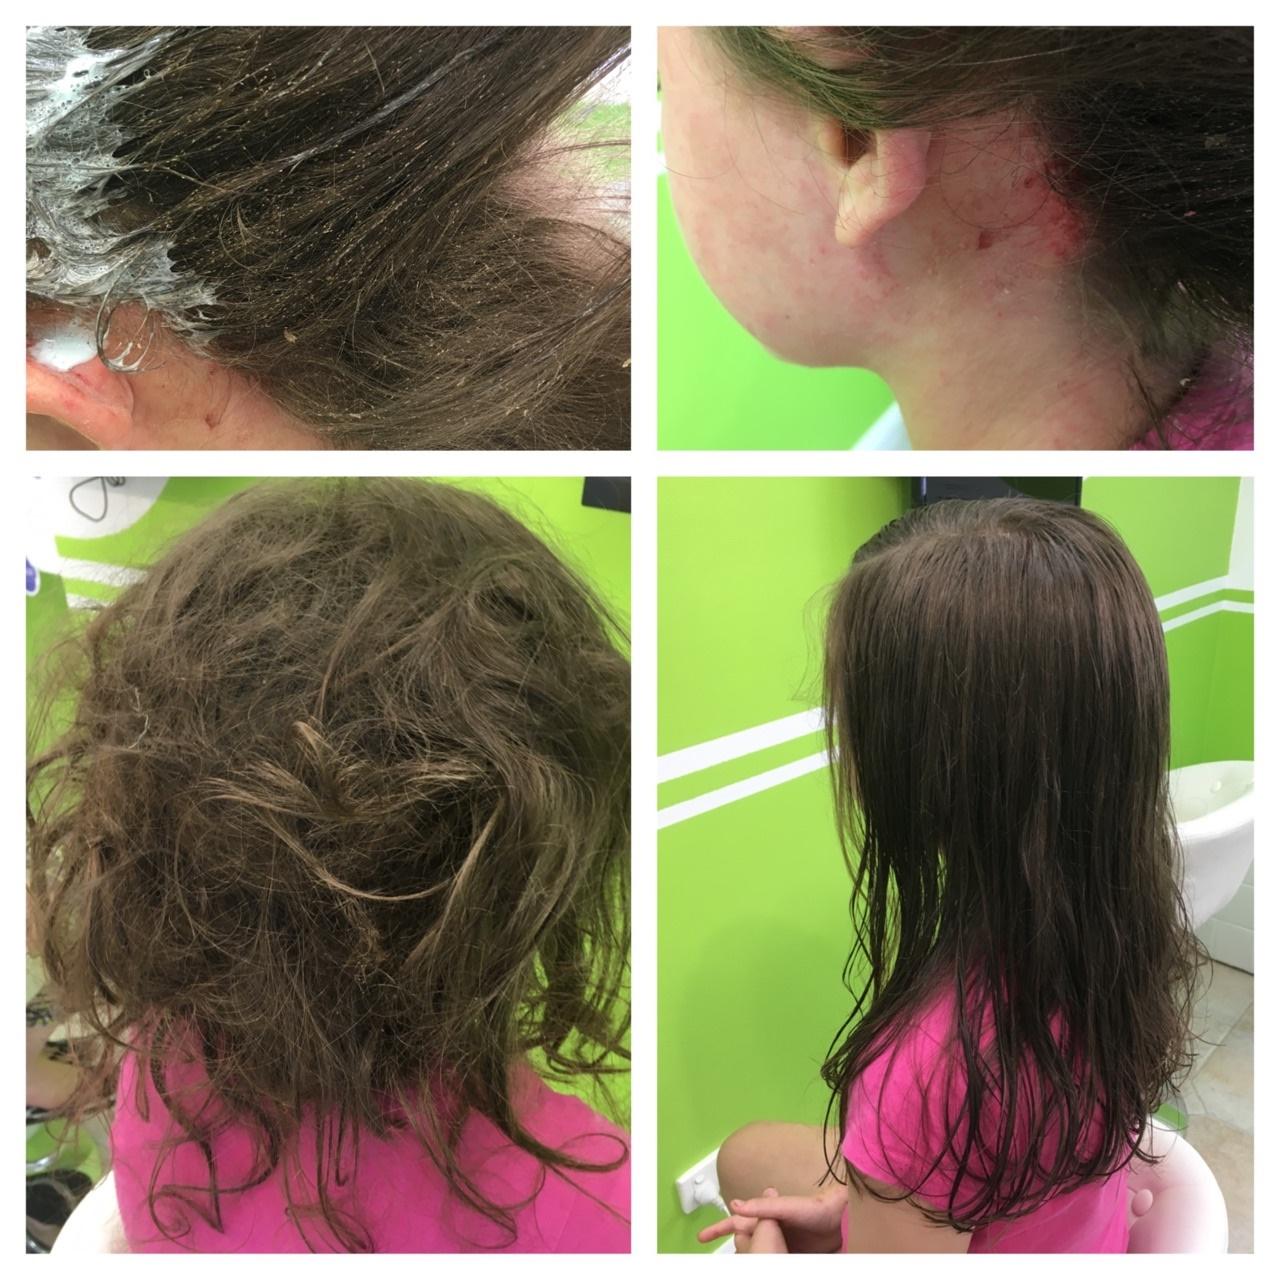 Nitpro - Severe head lice